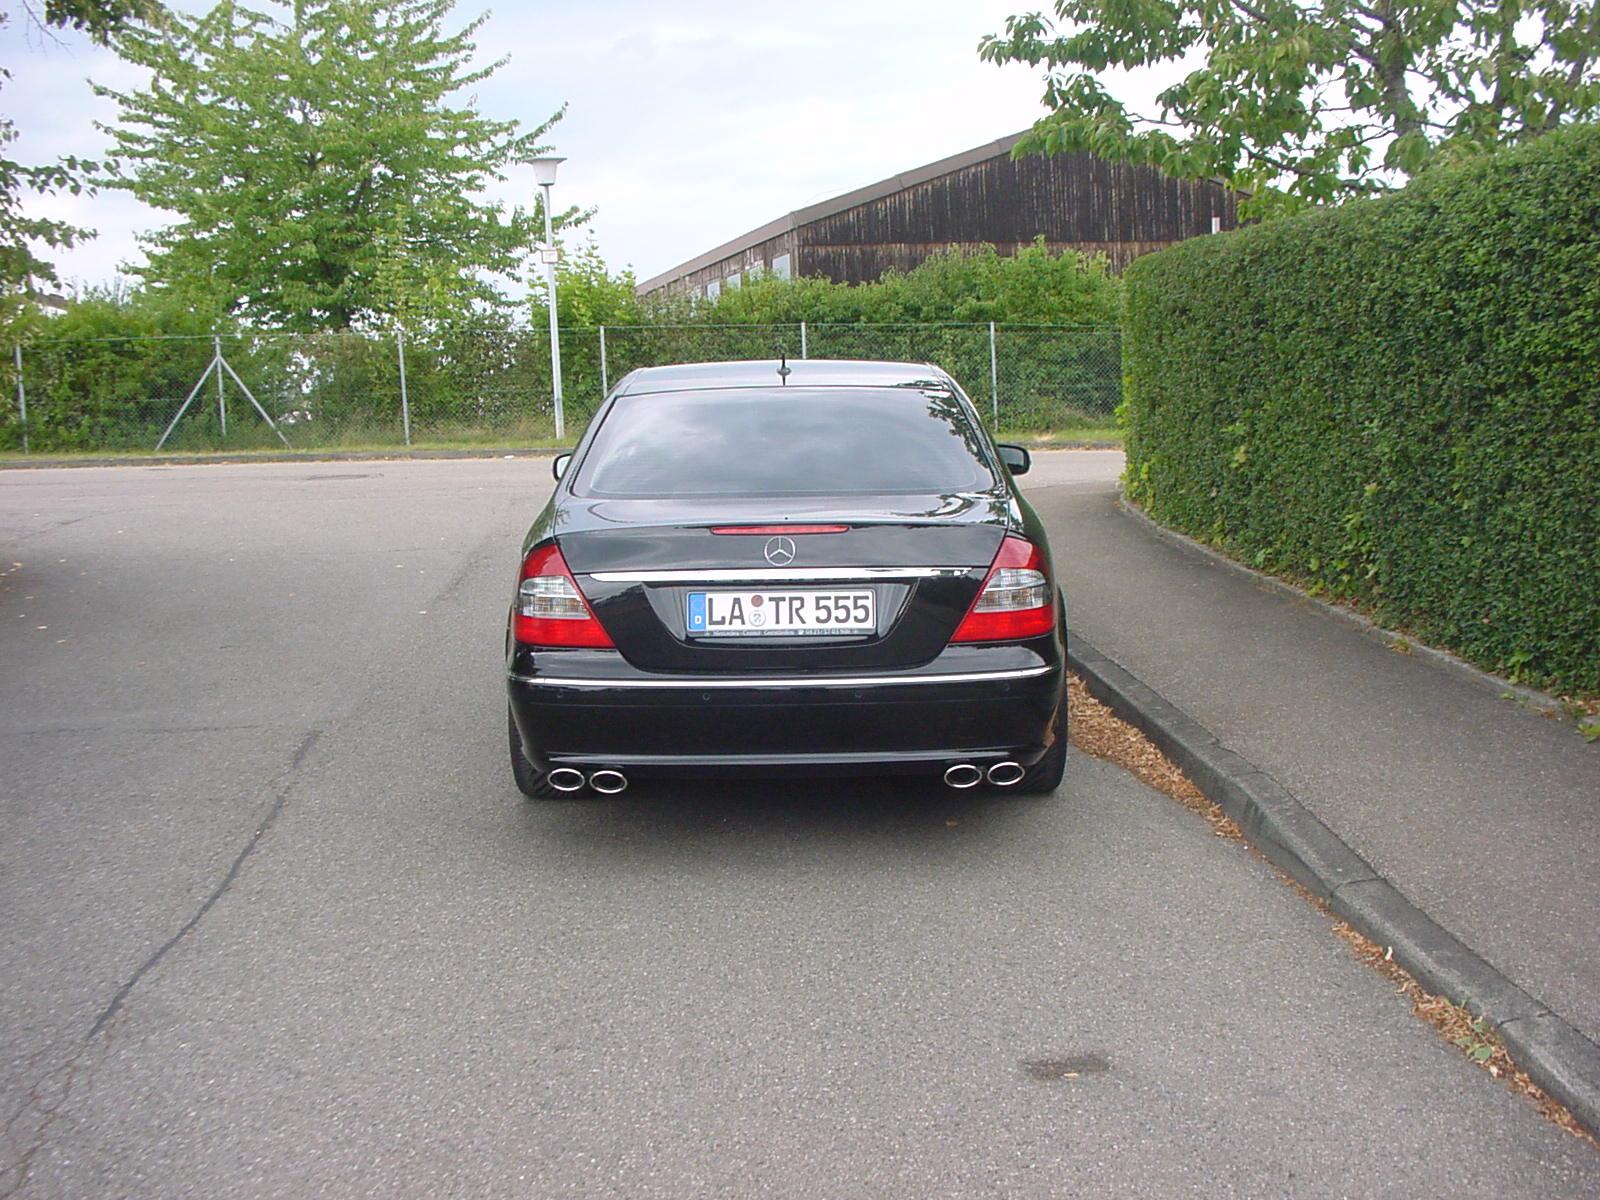 E-Klasse W211 Auspuff Sportauspuff Endrohre Sportendrohre Göckel